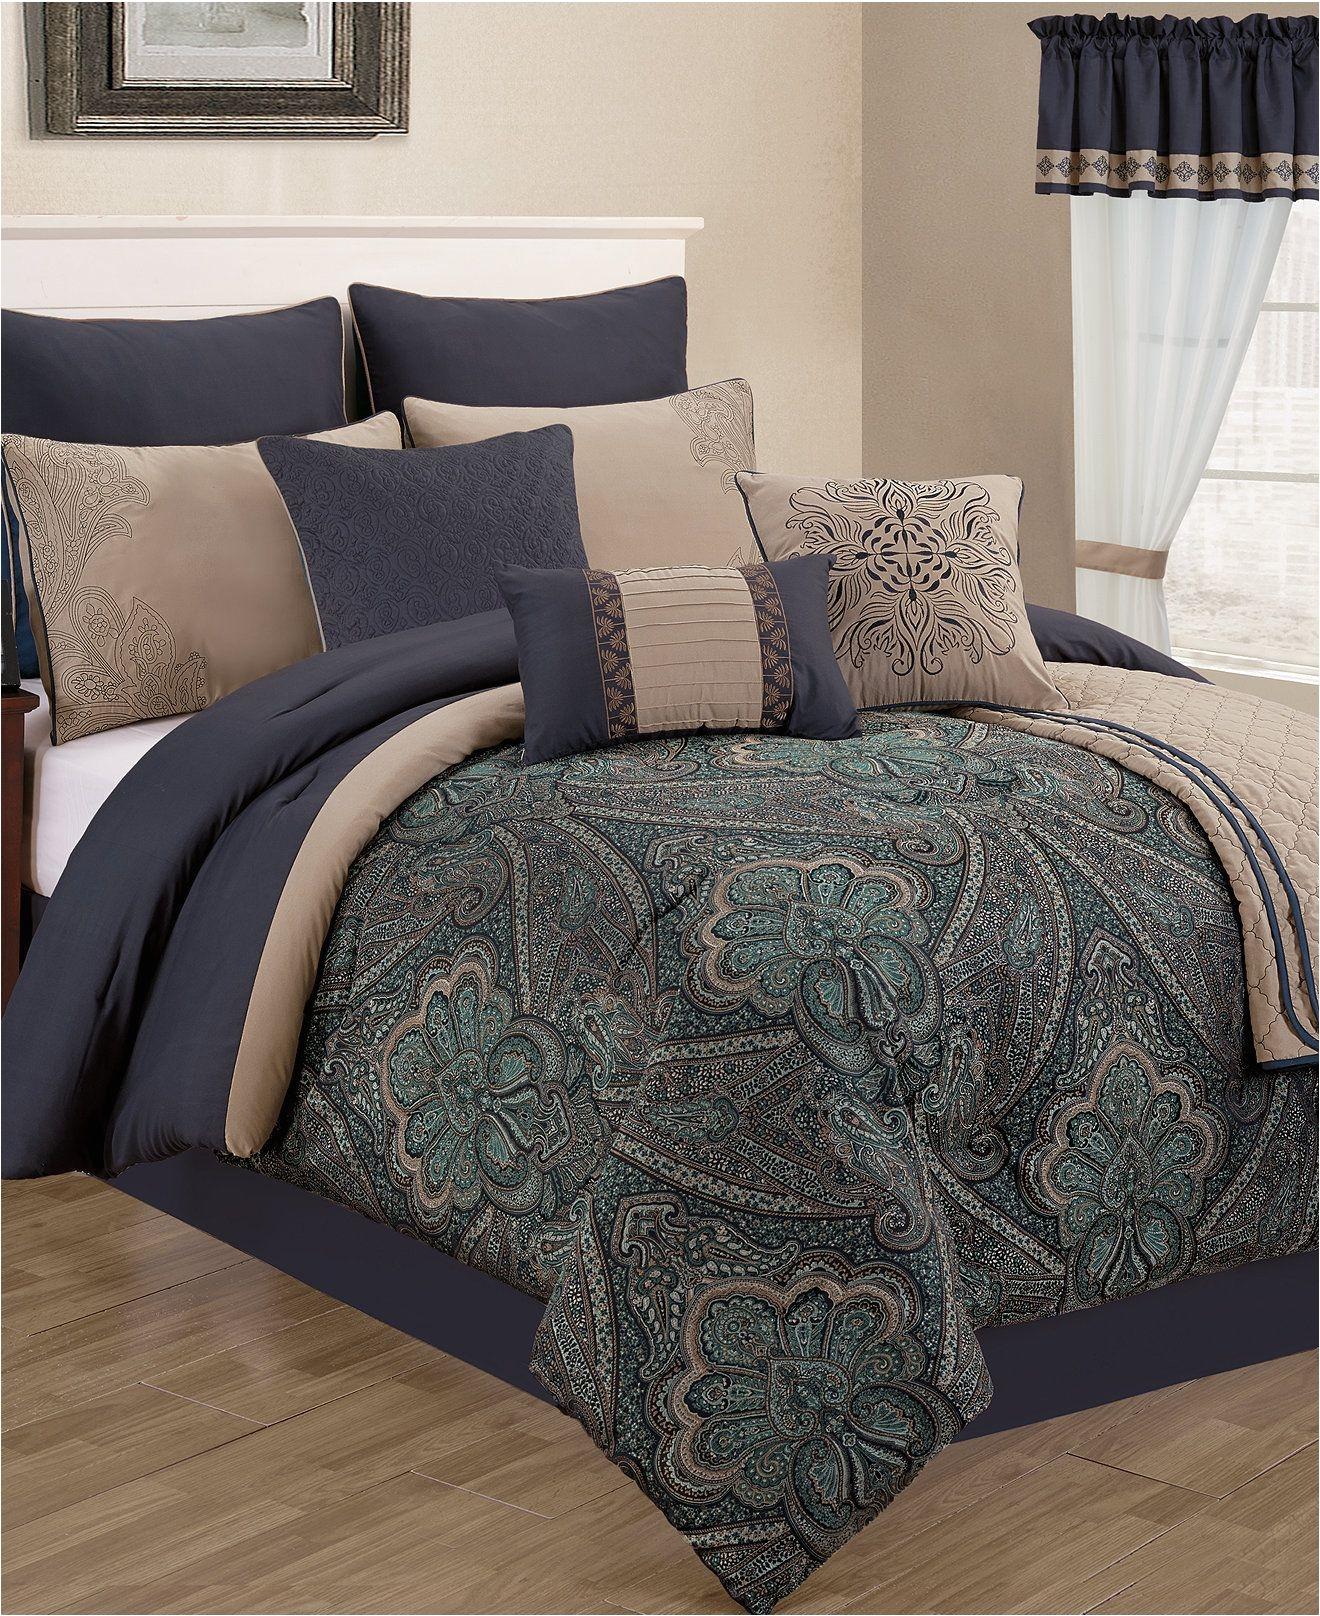 bradbury 22 piece comforter sets bed in a bag bed bath macy s